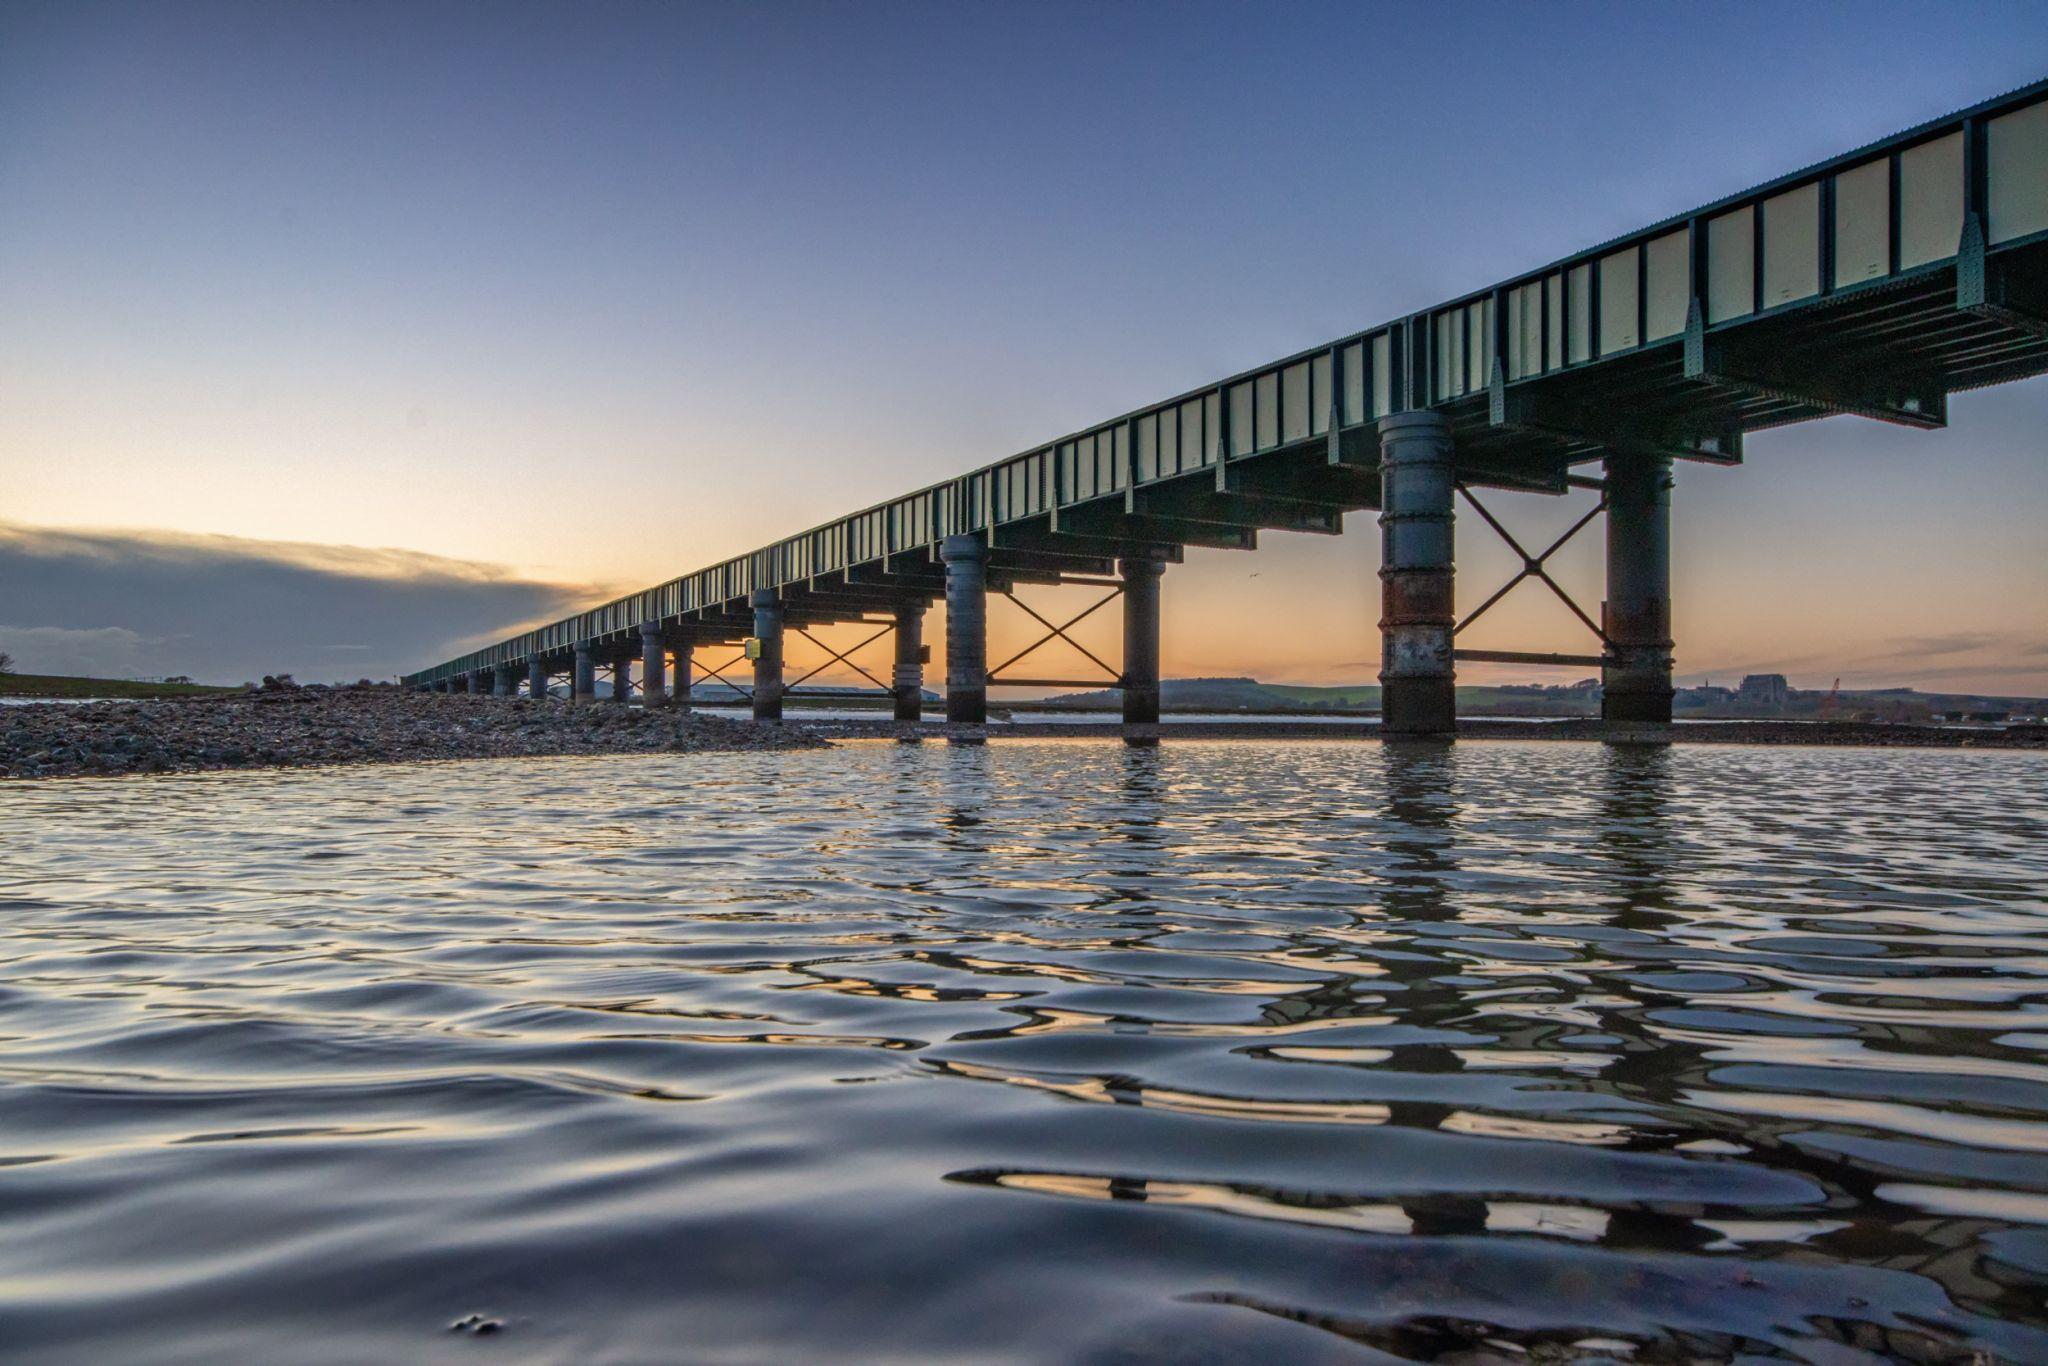 Railway Bridge across River Adur, Shoreham, United Kingdom